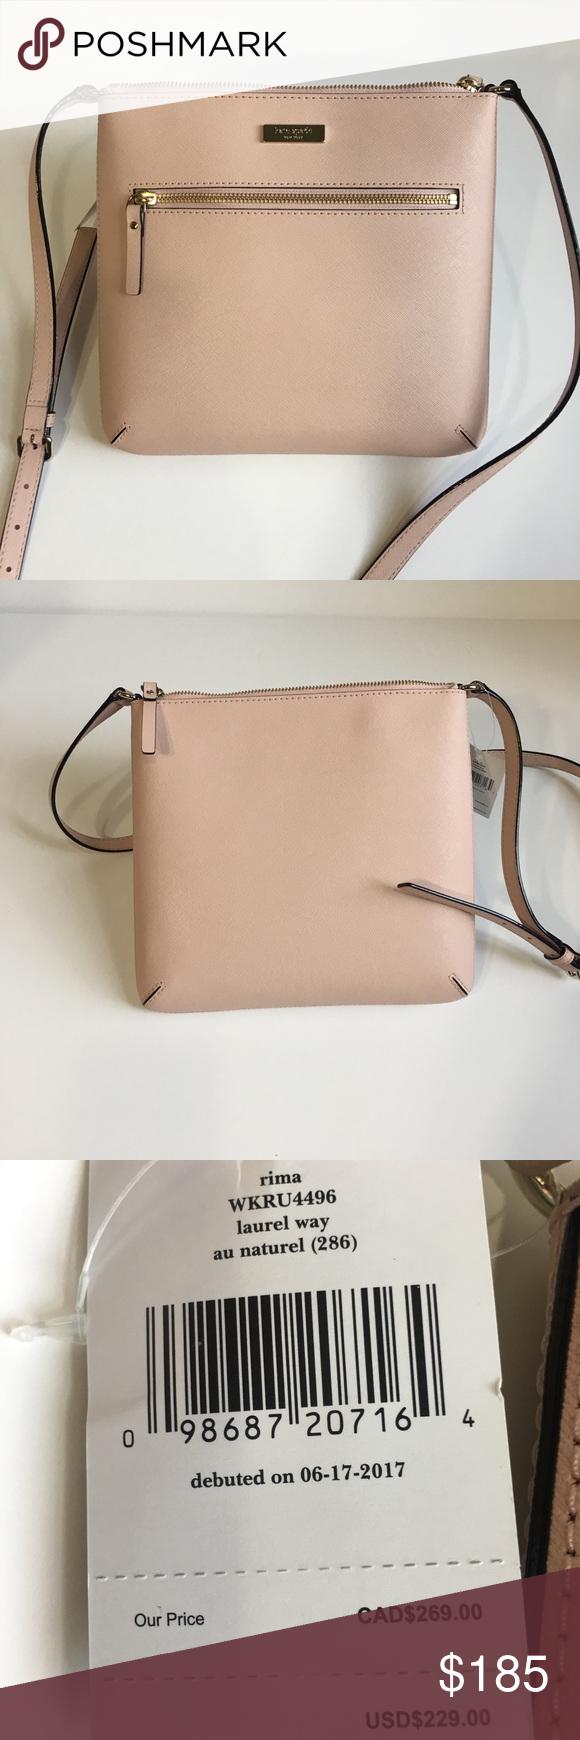 Kate Spade WKRU4496 New York Rima Laurel Way Leather Crossbody Bag